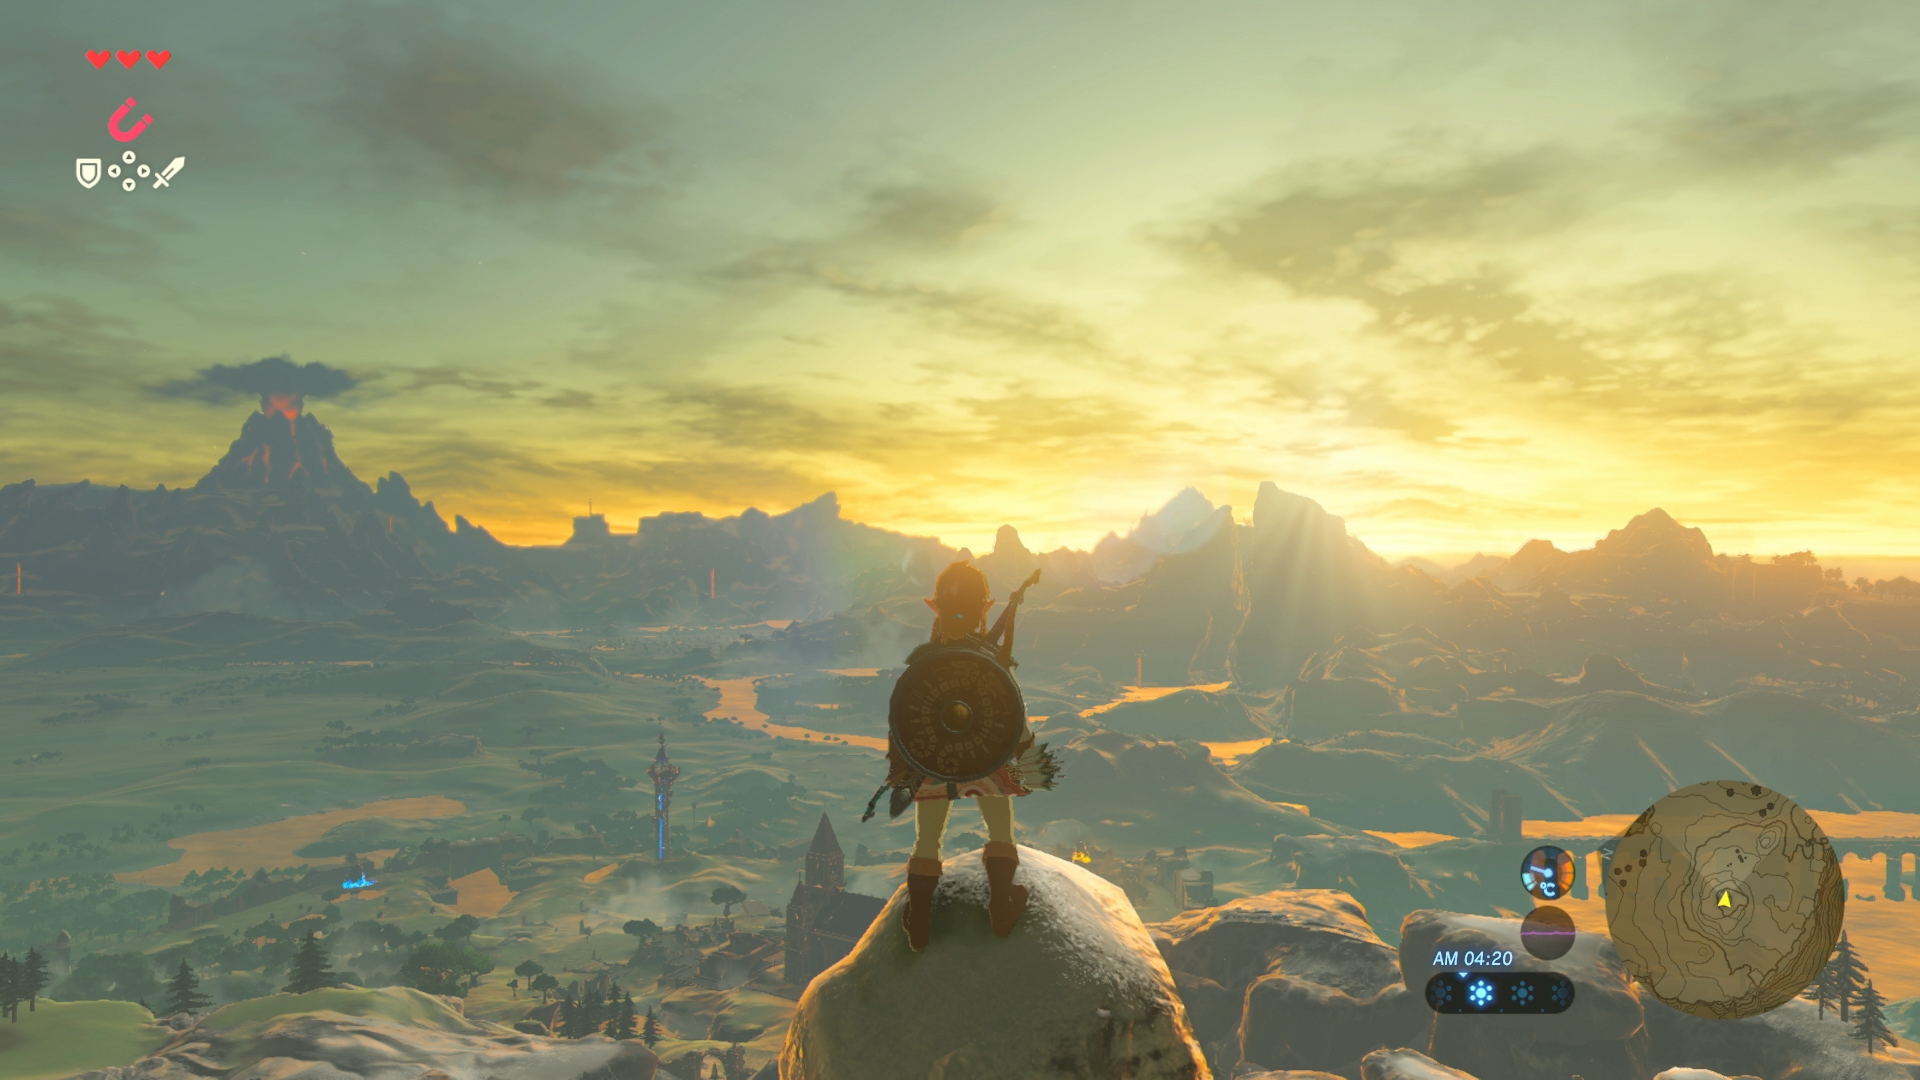 Nové screenshoty z The Legend of Zelda: Breath of the Wild 139308